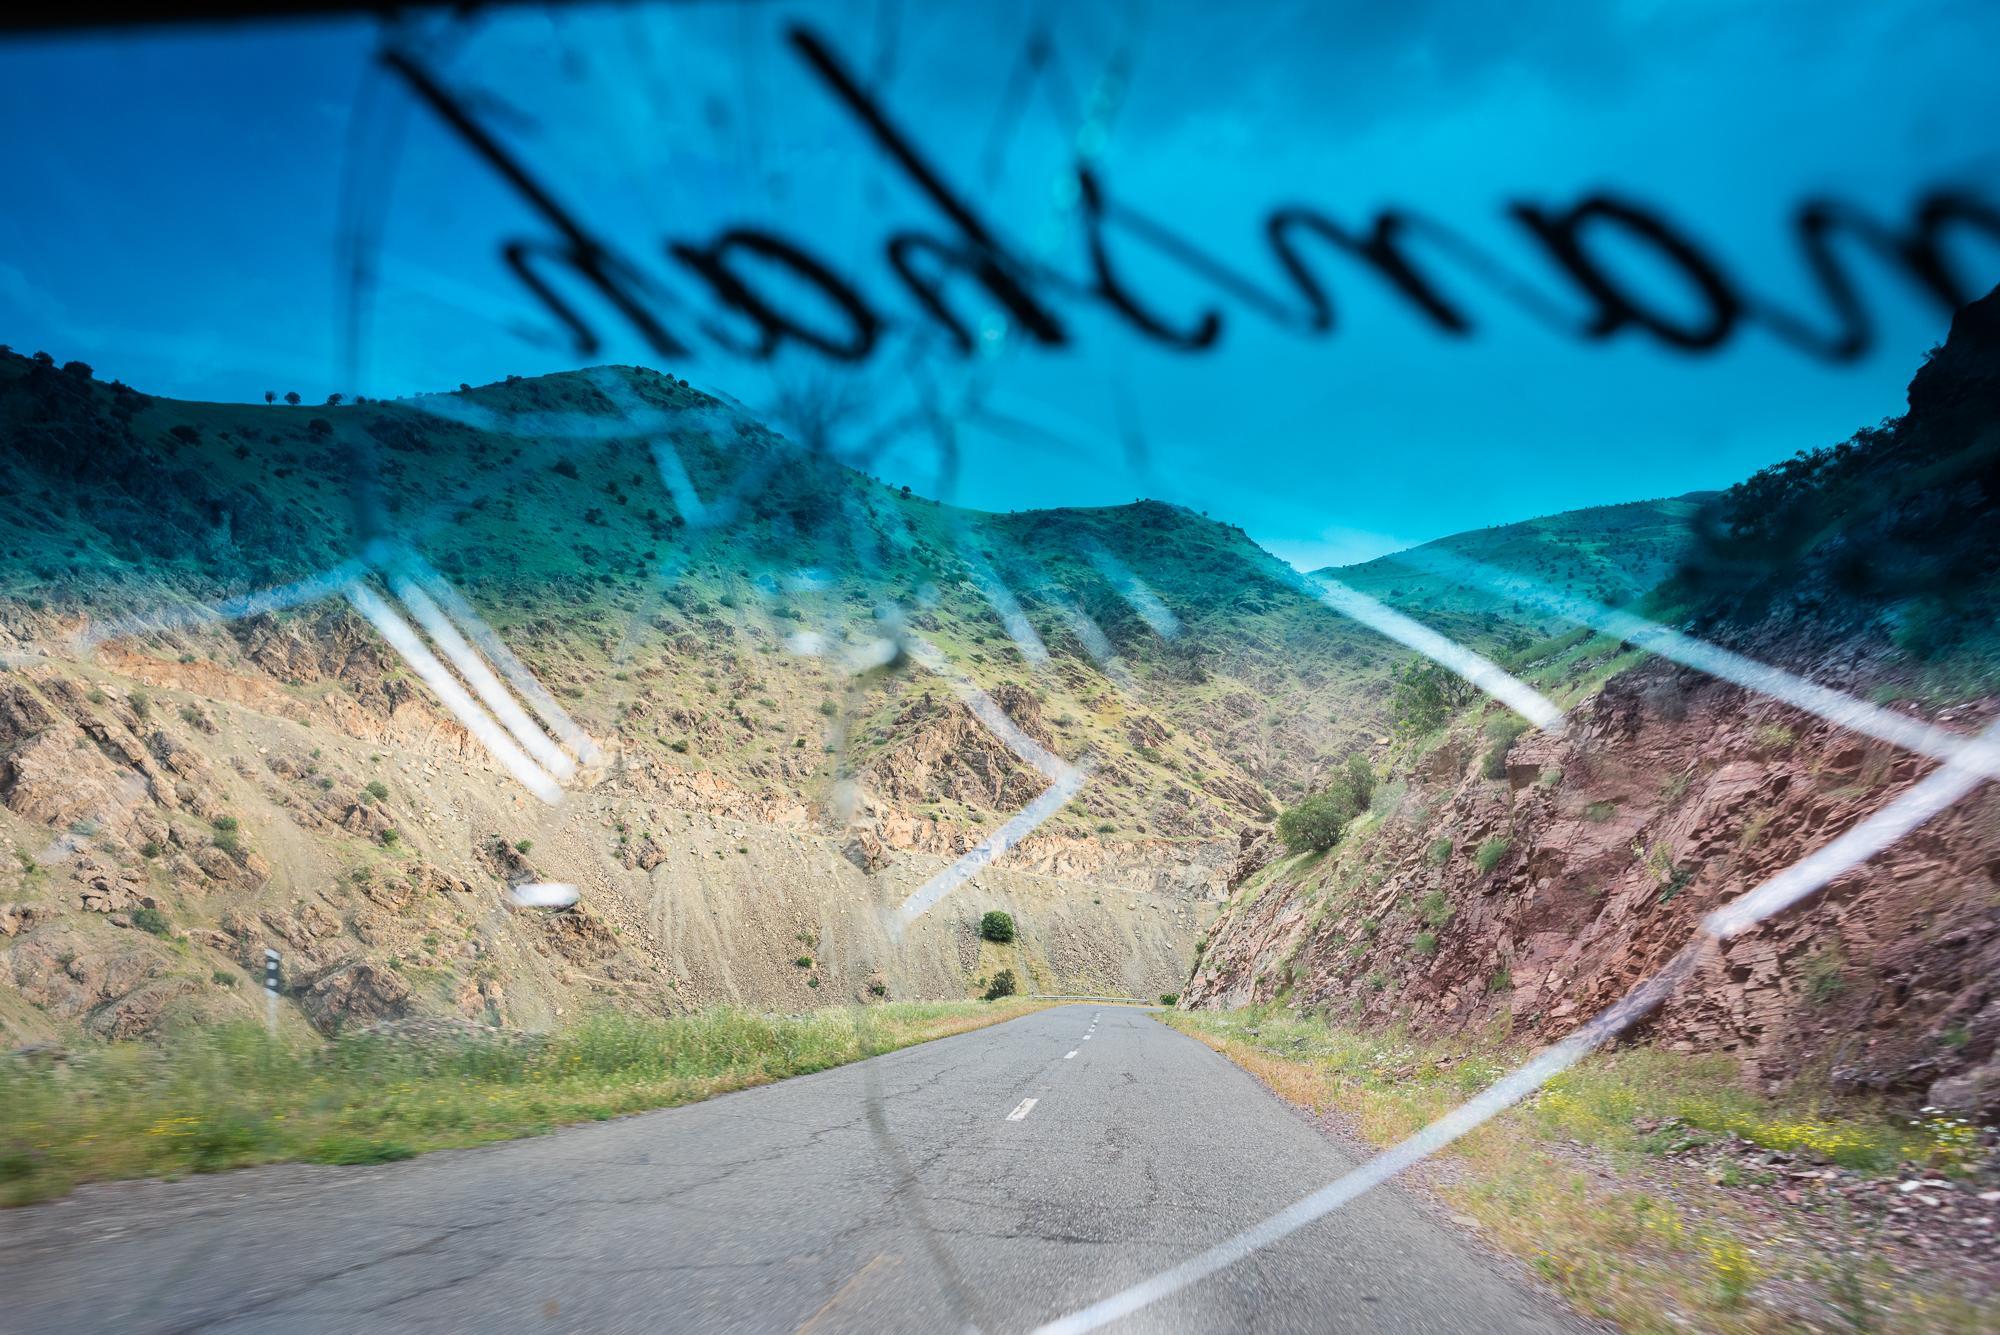 PALANGAN, IRAN – MAY 22, 2018: On the way to Hewraman Valley, Iranian Kurdistan.